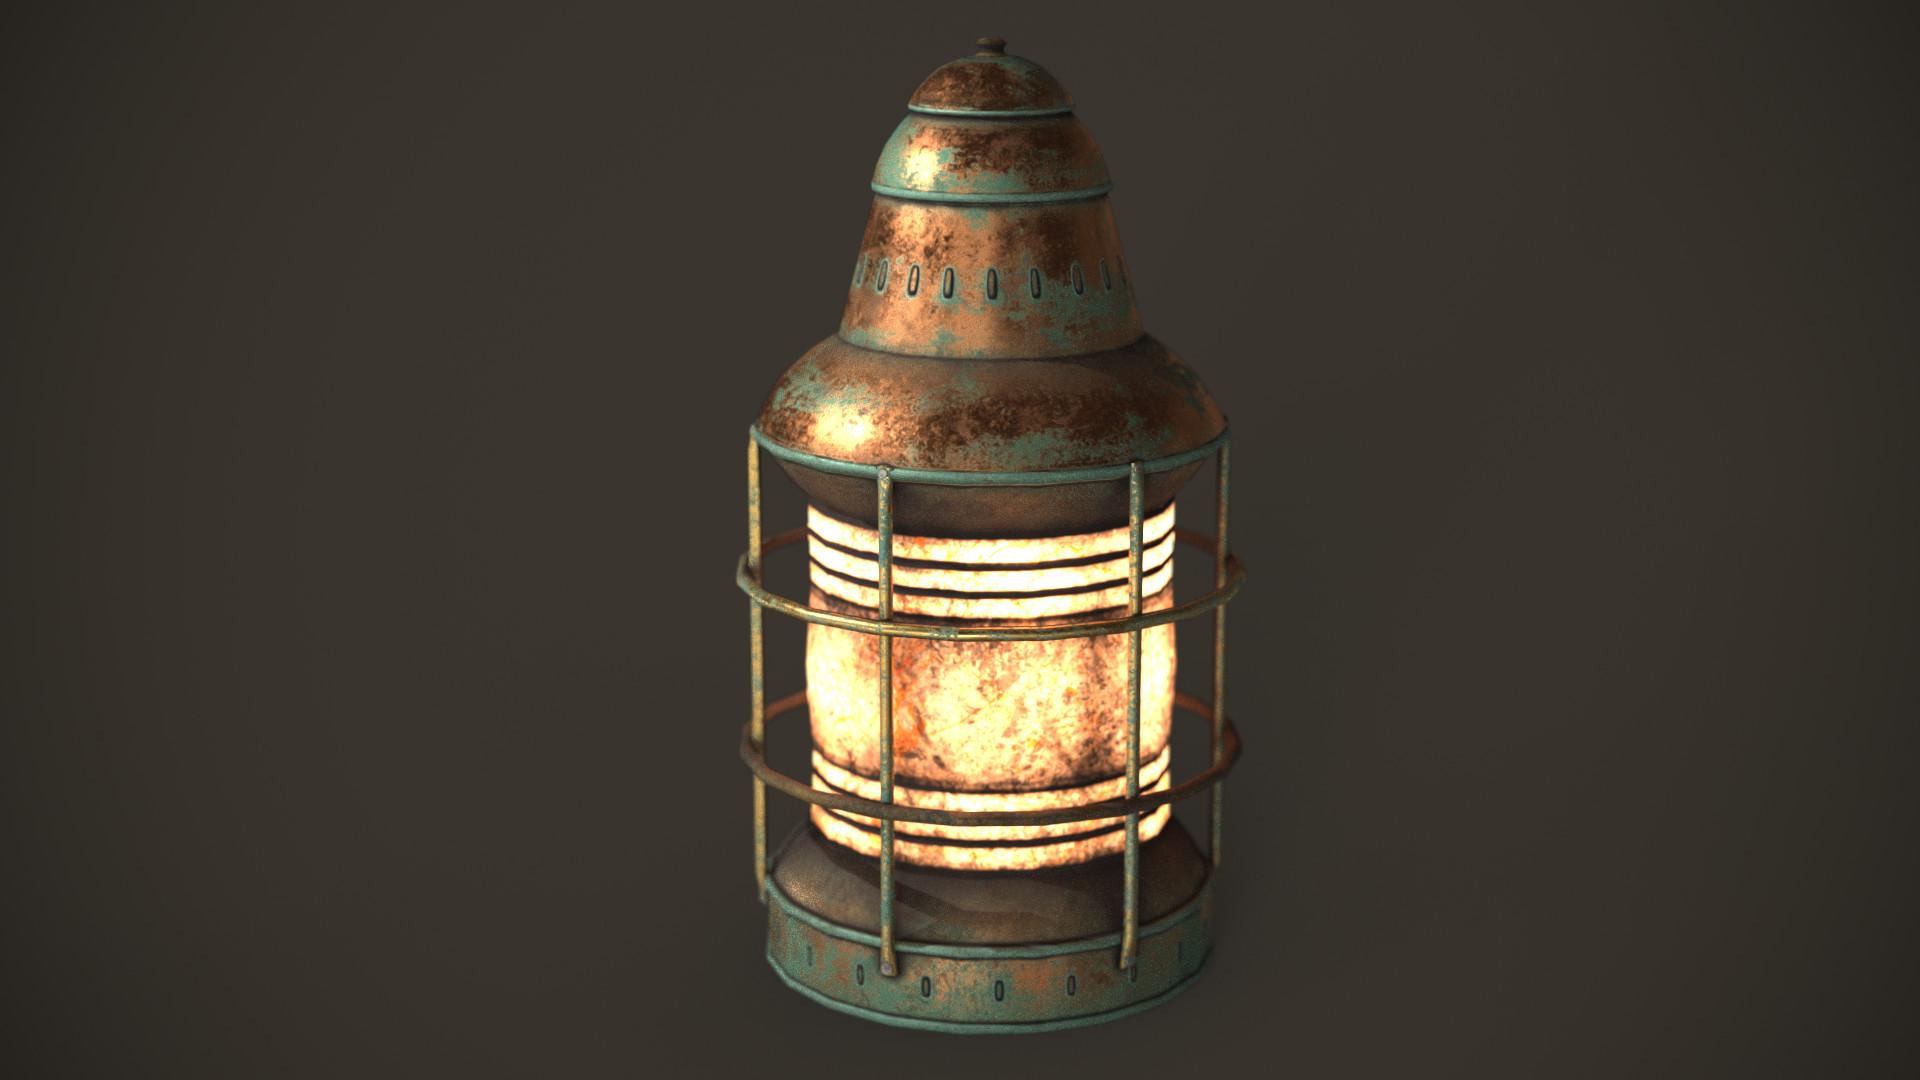 Leonardo iezzi 007 lantern